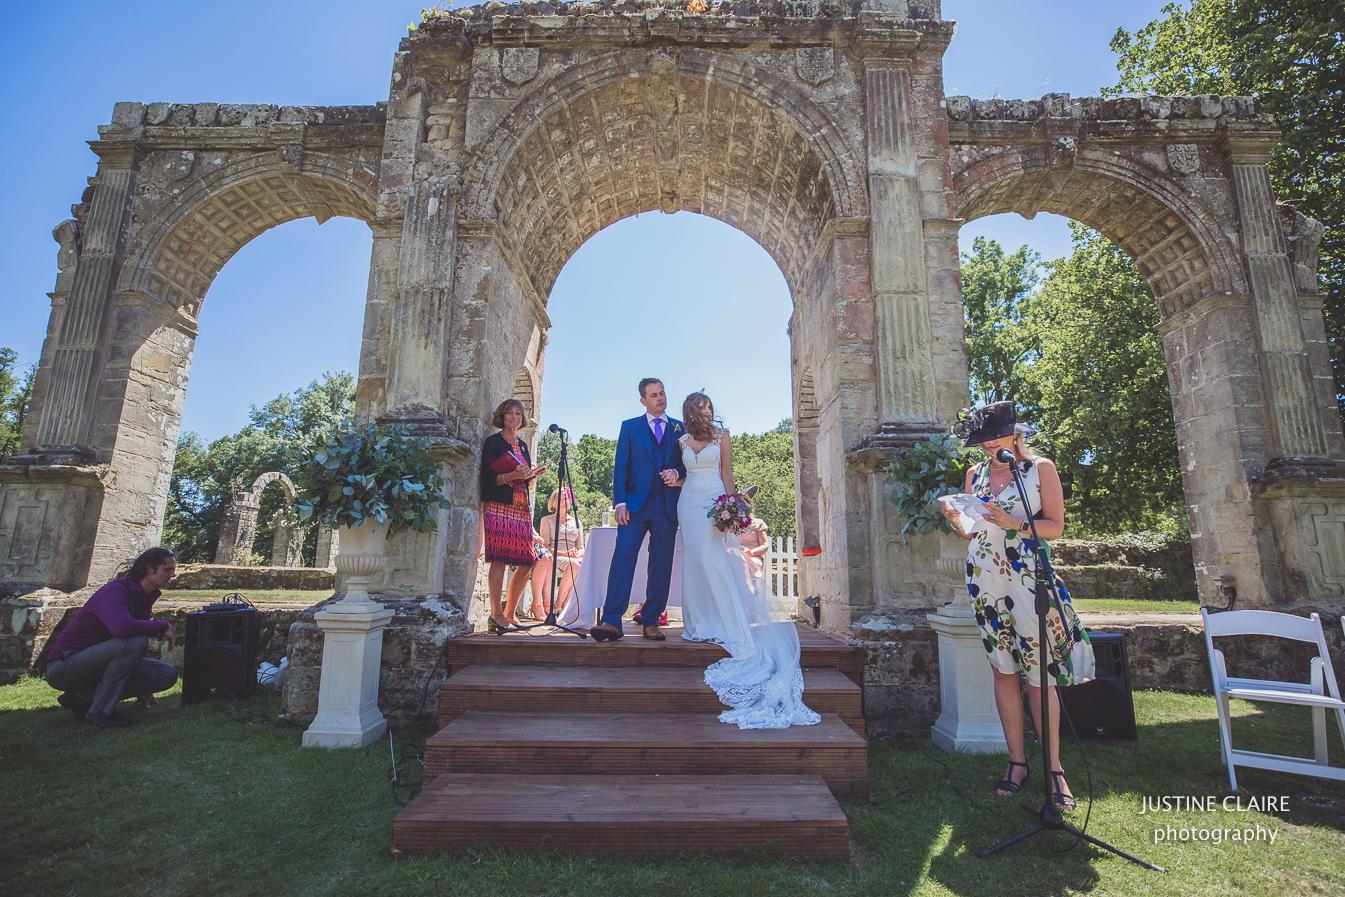 slaugham place wedding photographer-1.jpg